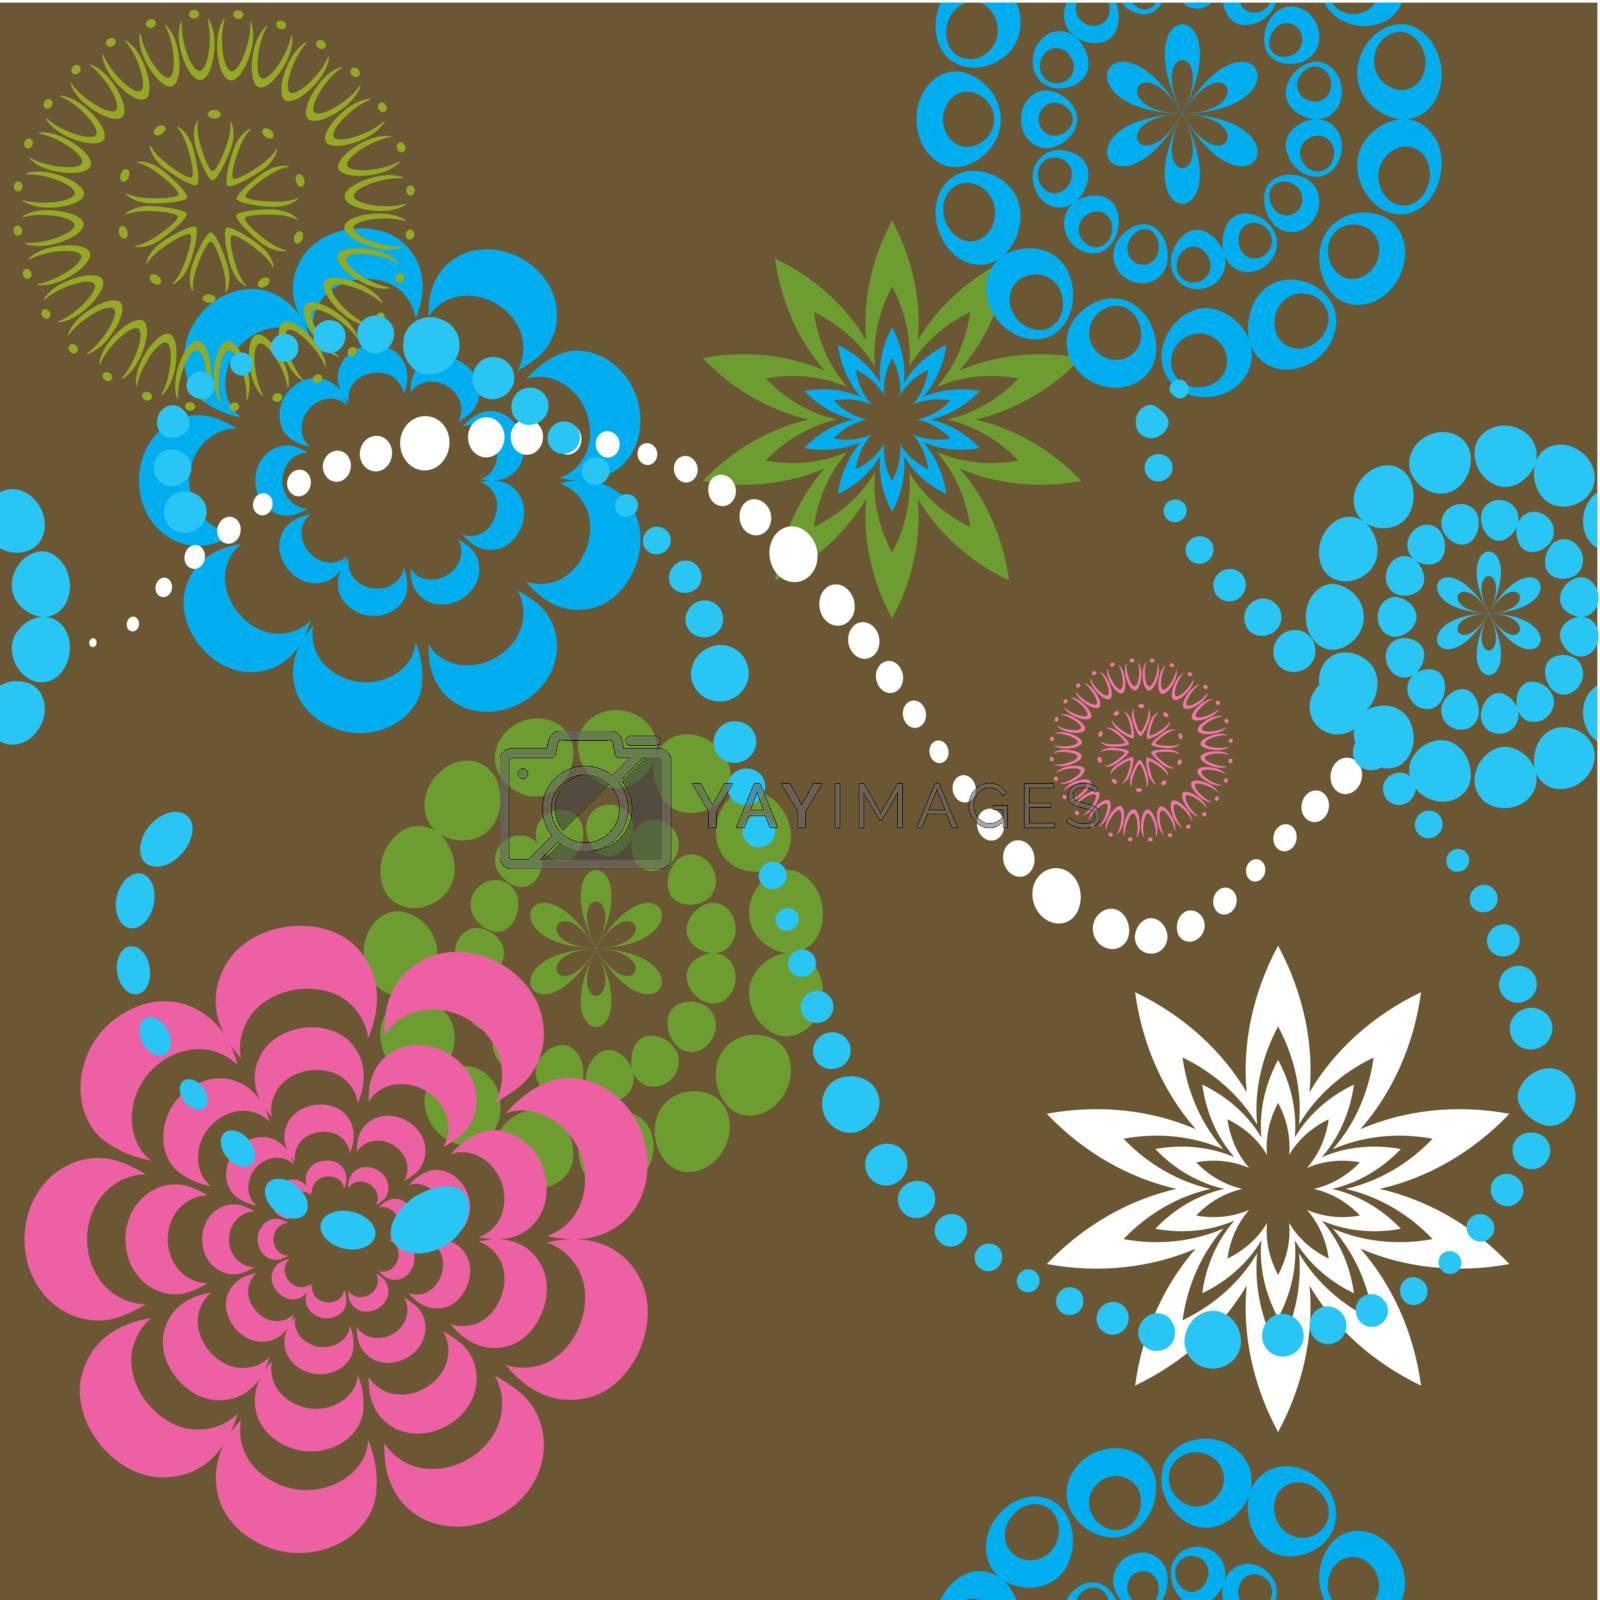 Flower Nature Background. Vector Illustration